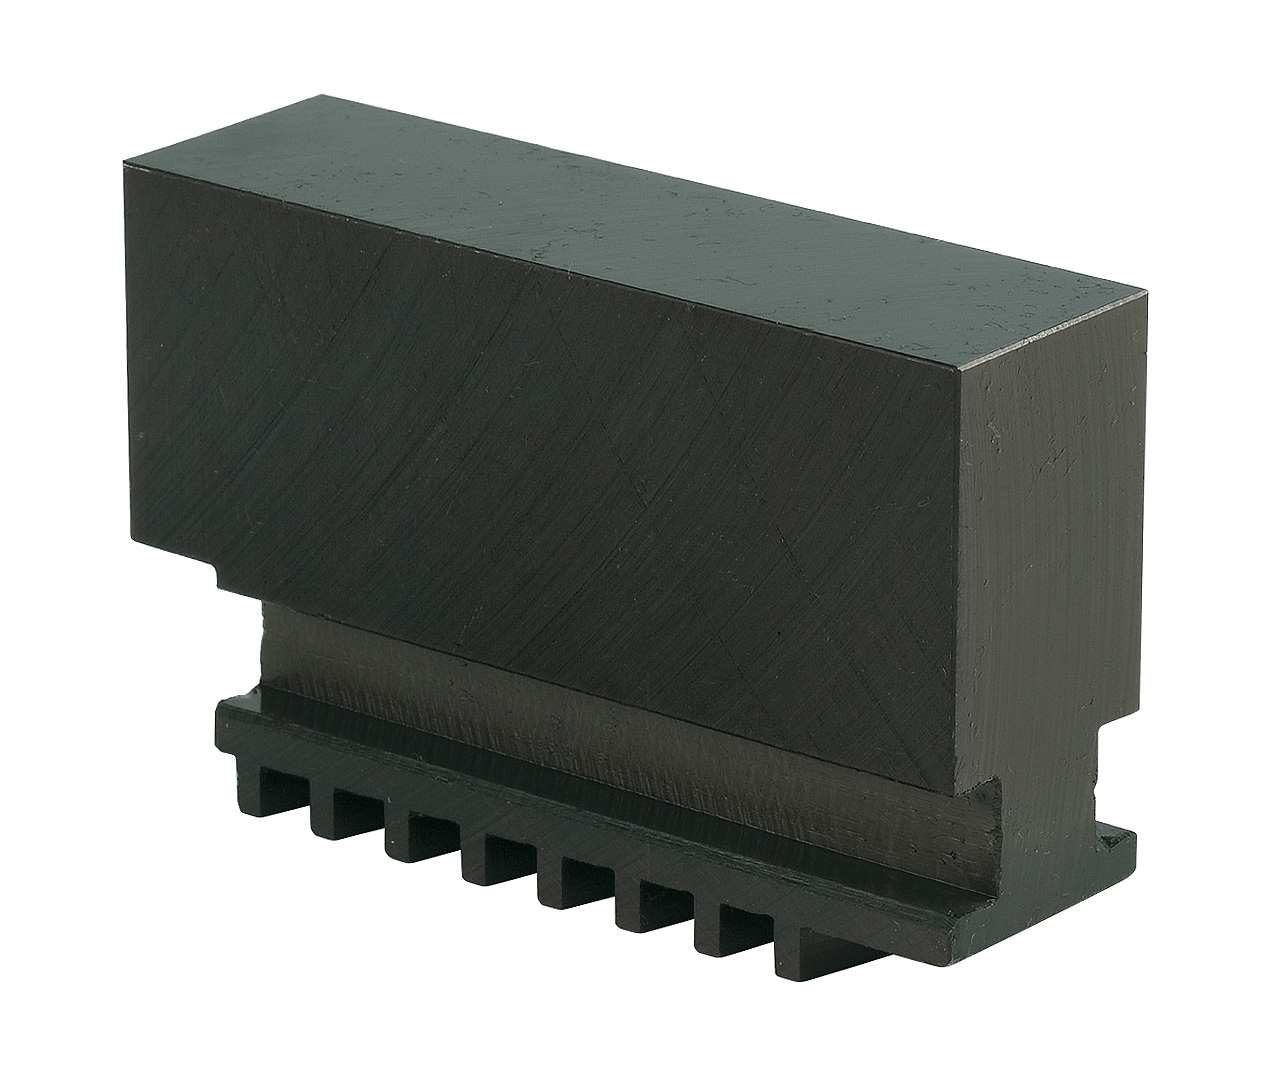 Szczęki jednolite miękkie - komplet SJ-PS3-160 BERNARDO